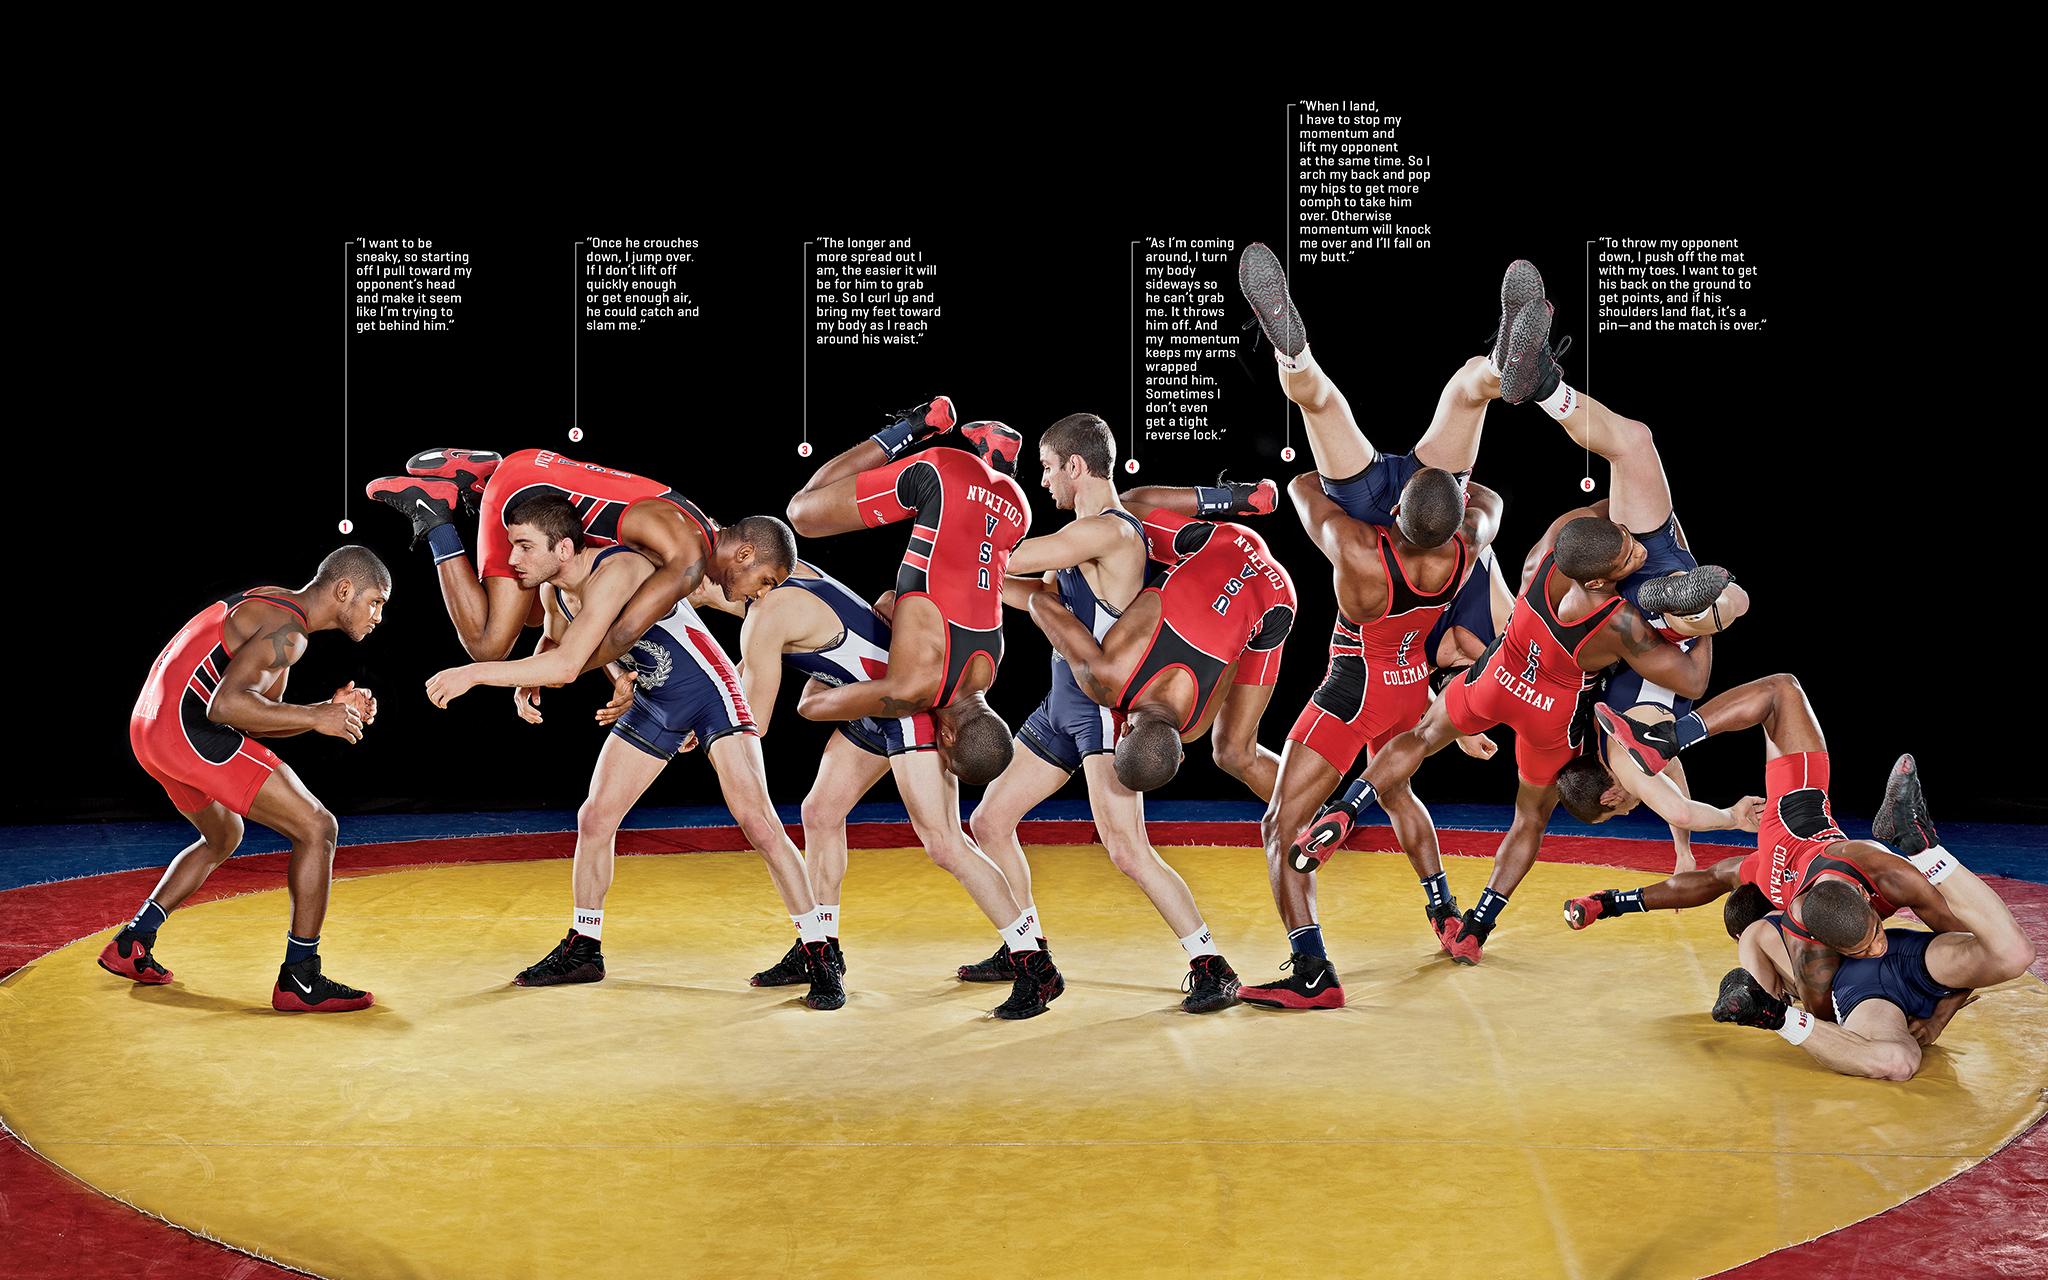 Ellis Coleman, U.S. Olympic Wrestler